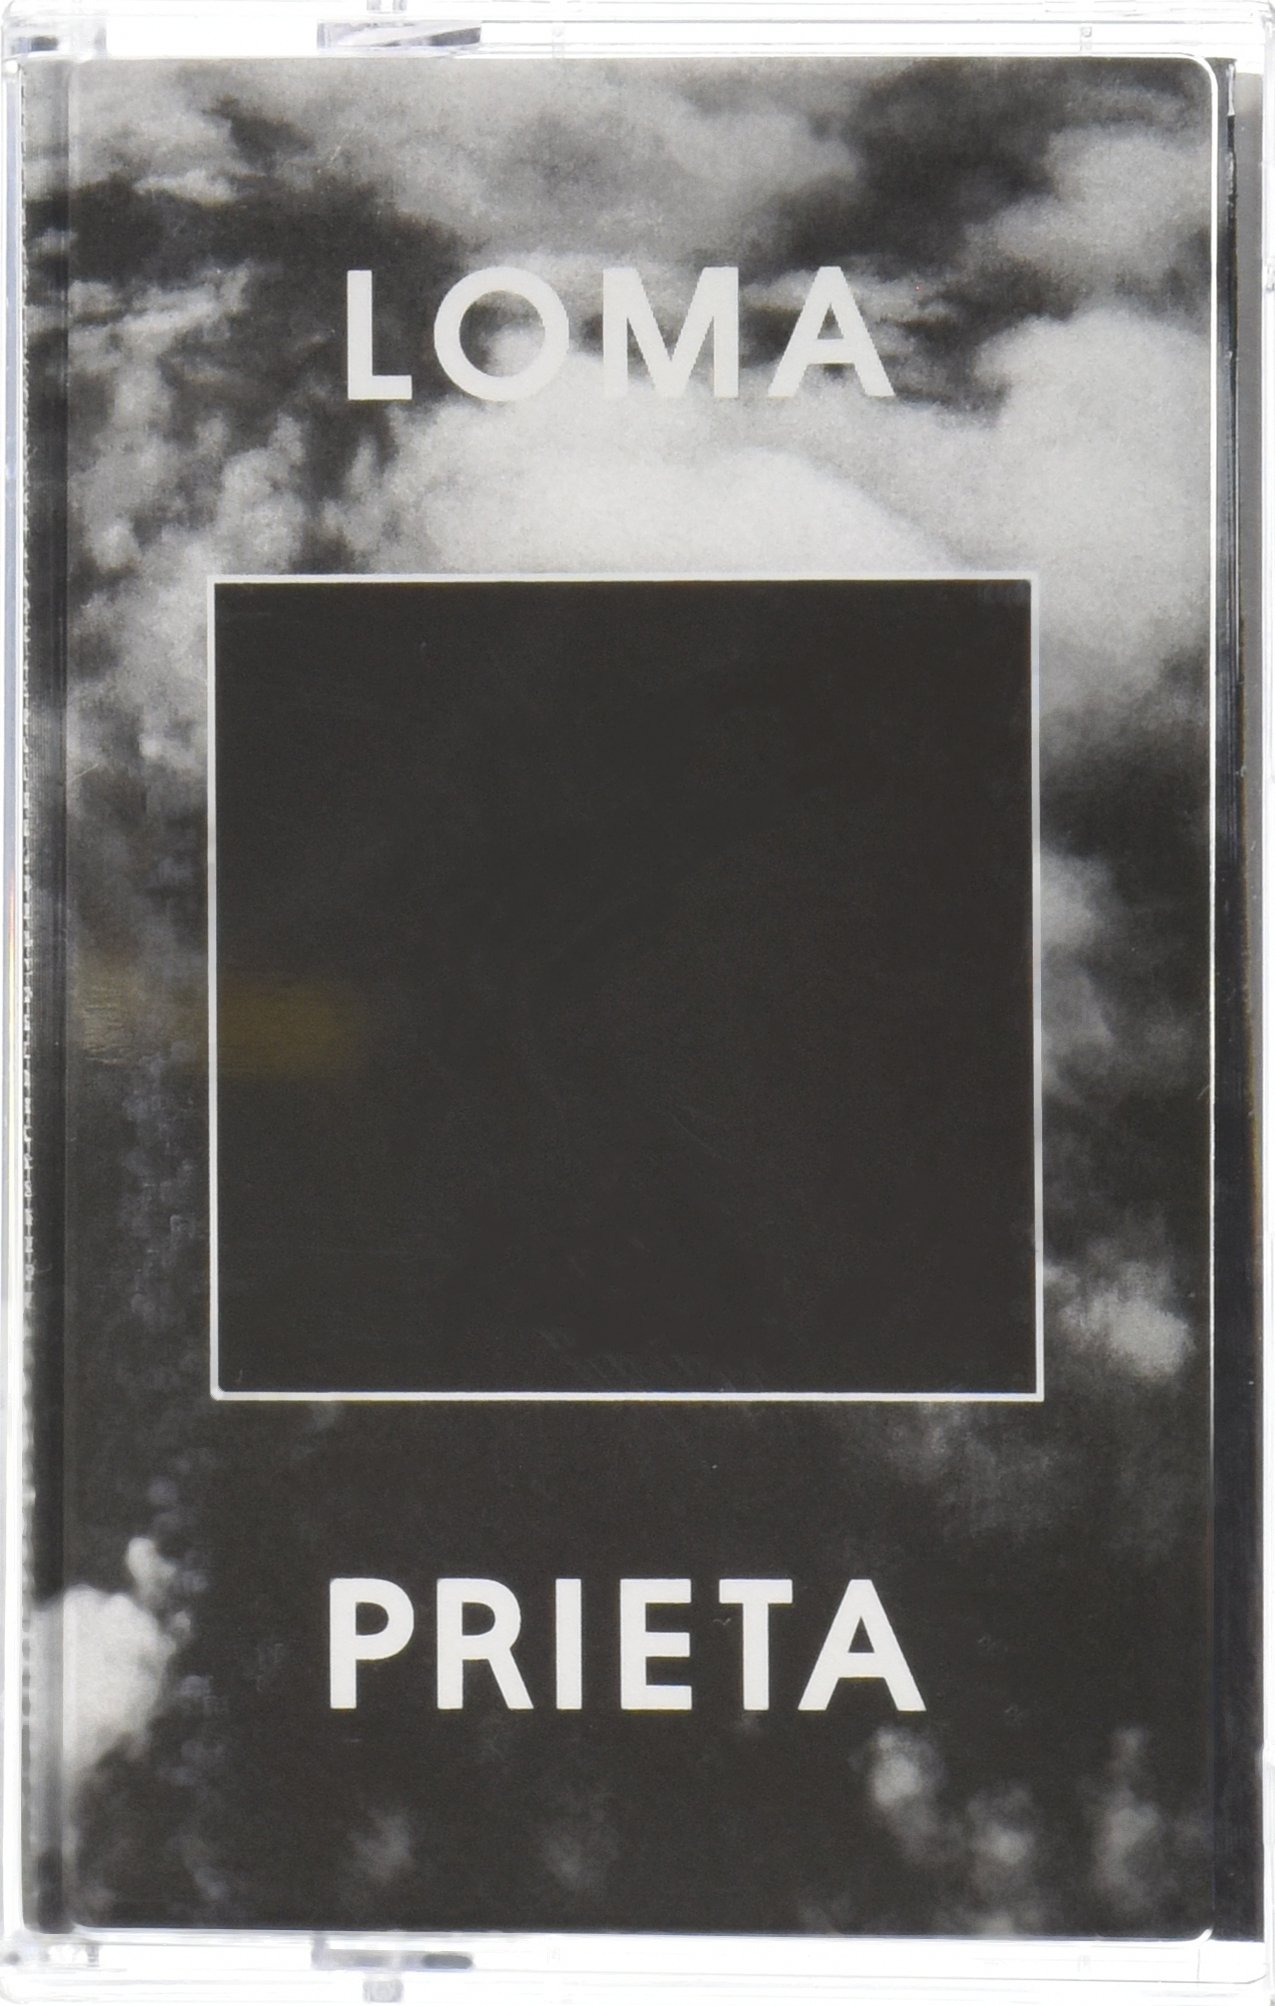 Cassette : Loma Prieta - Self Portrait (Cassette)